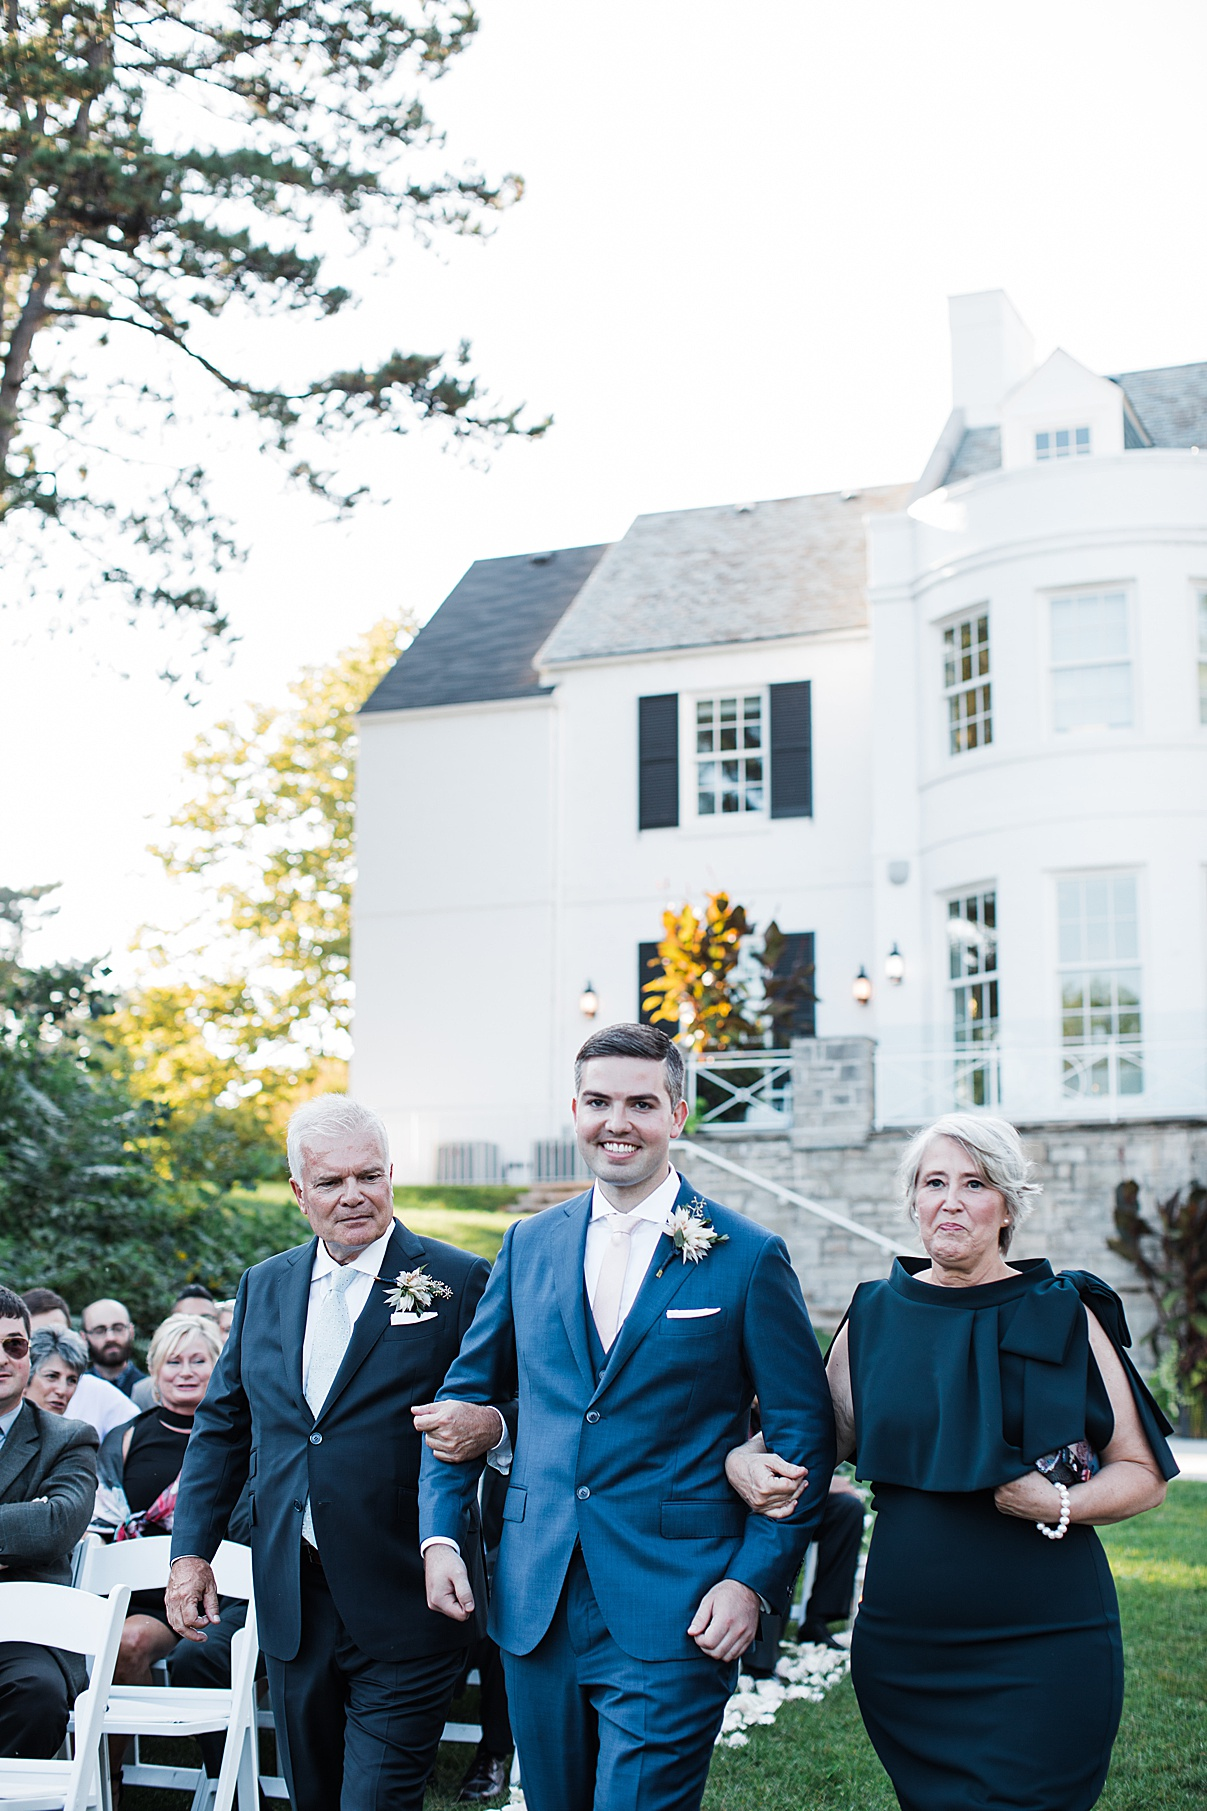 Groom walking down aisle with parents| Harding Waterfront Estate Wedding| Ontario wedding photographer| Toronto wedding photographer| 3 Photography | 3photography.ca